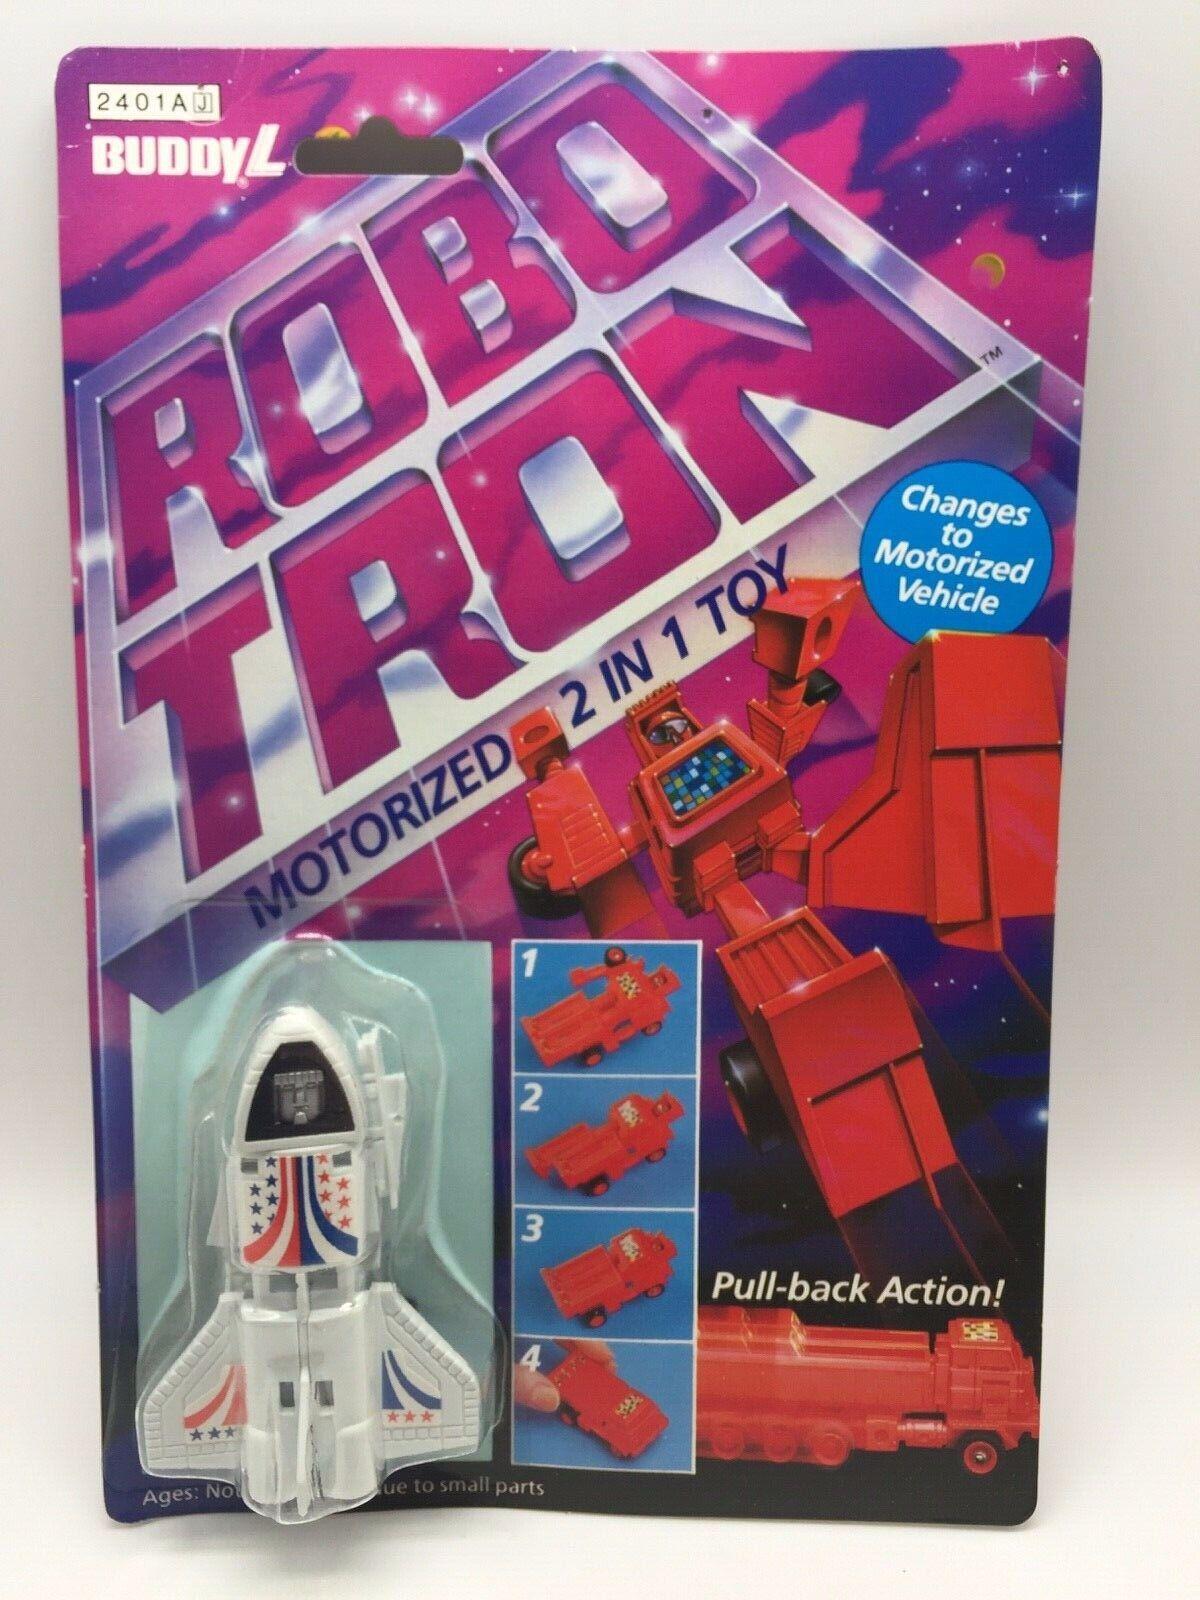 VINTAGE ROBO TRON spazio Shuttle Discovery MOTORIZZATA Transformer Robot Buddy L 84